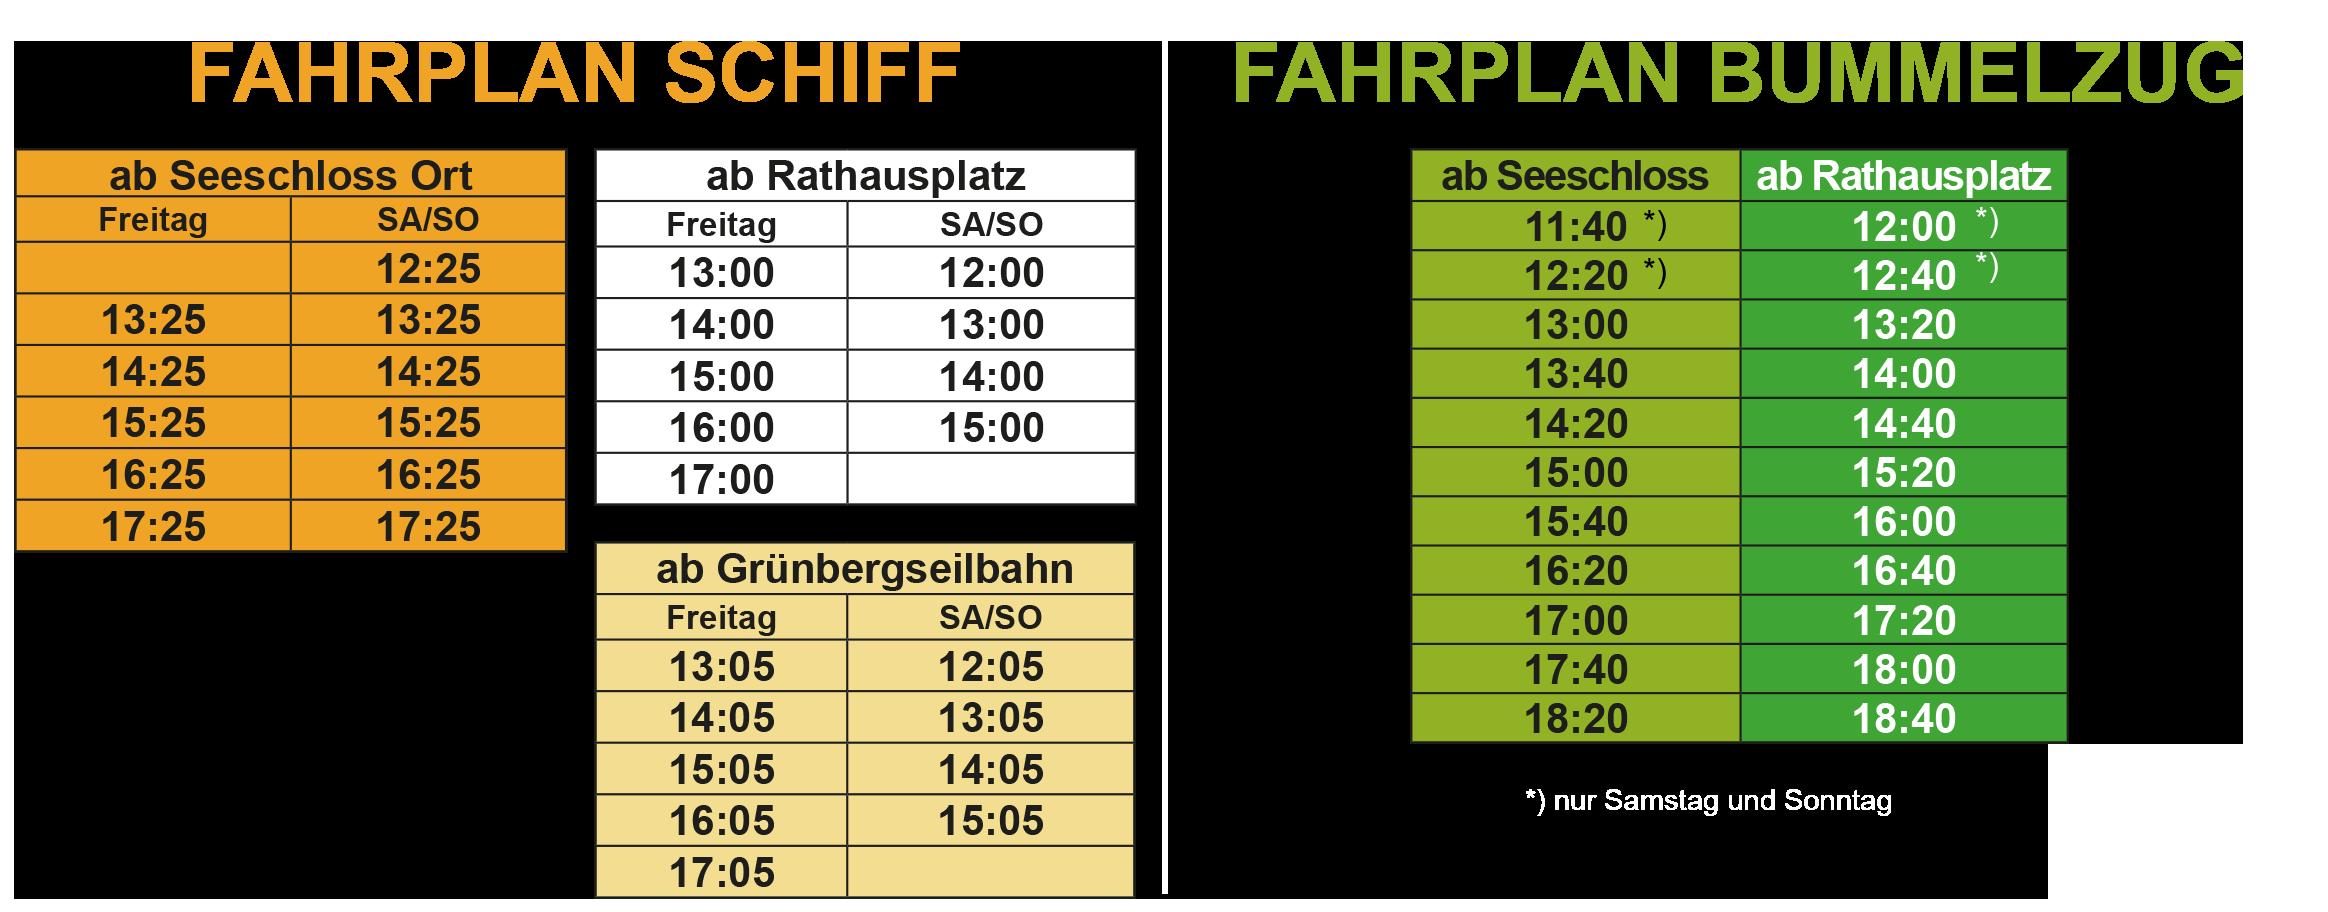 Fahrplan_Homepage